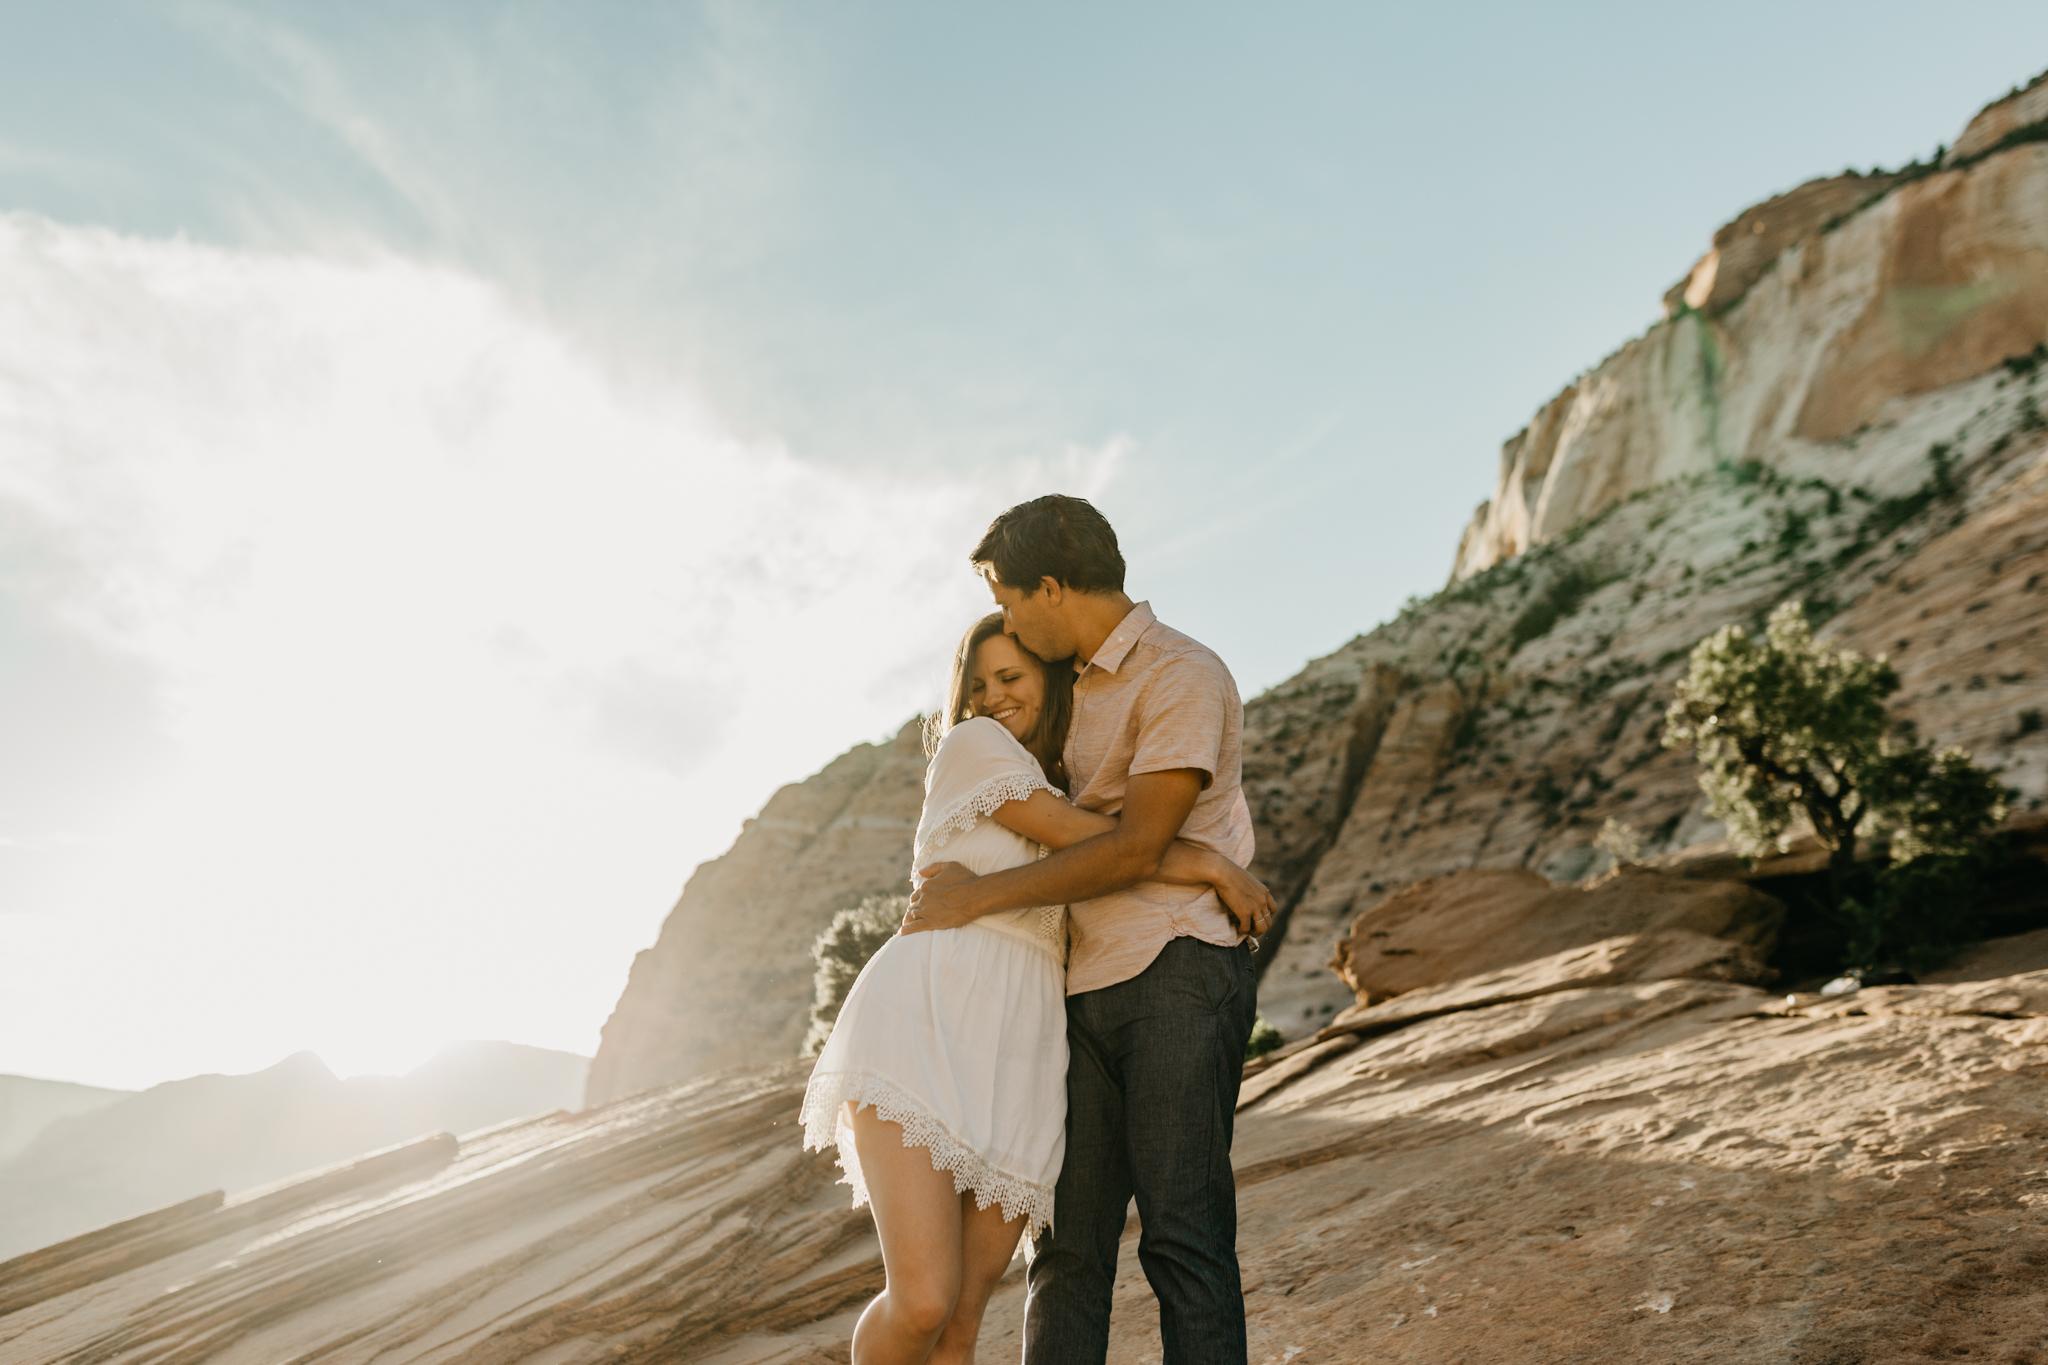 Abby&Austin-Engagement-shoot-Zion-National-Park-8007.jpg